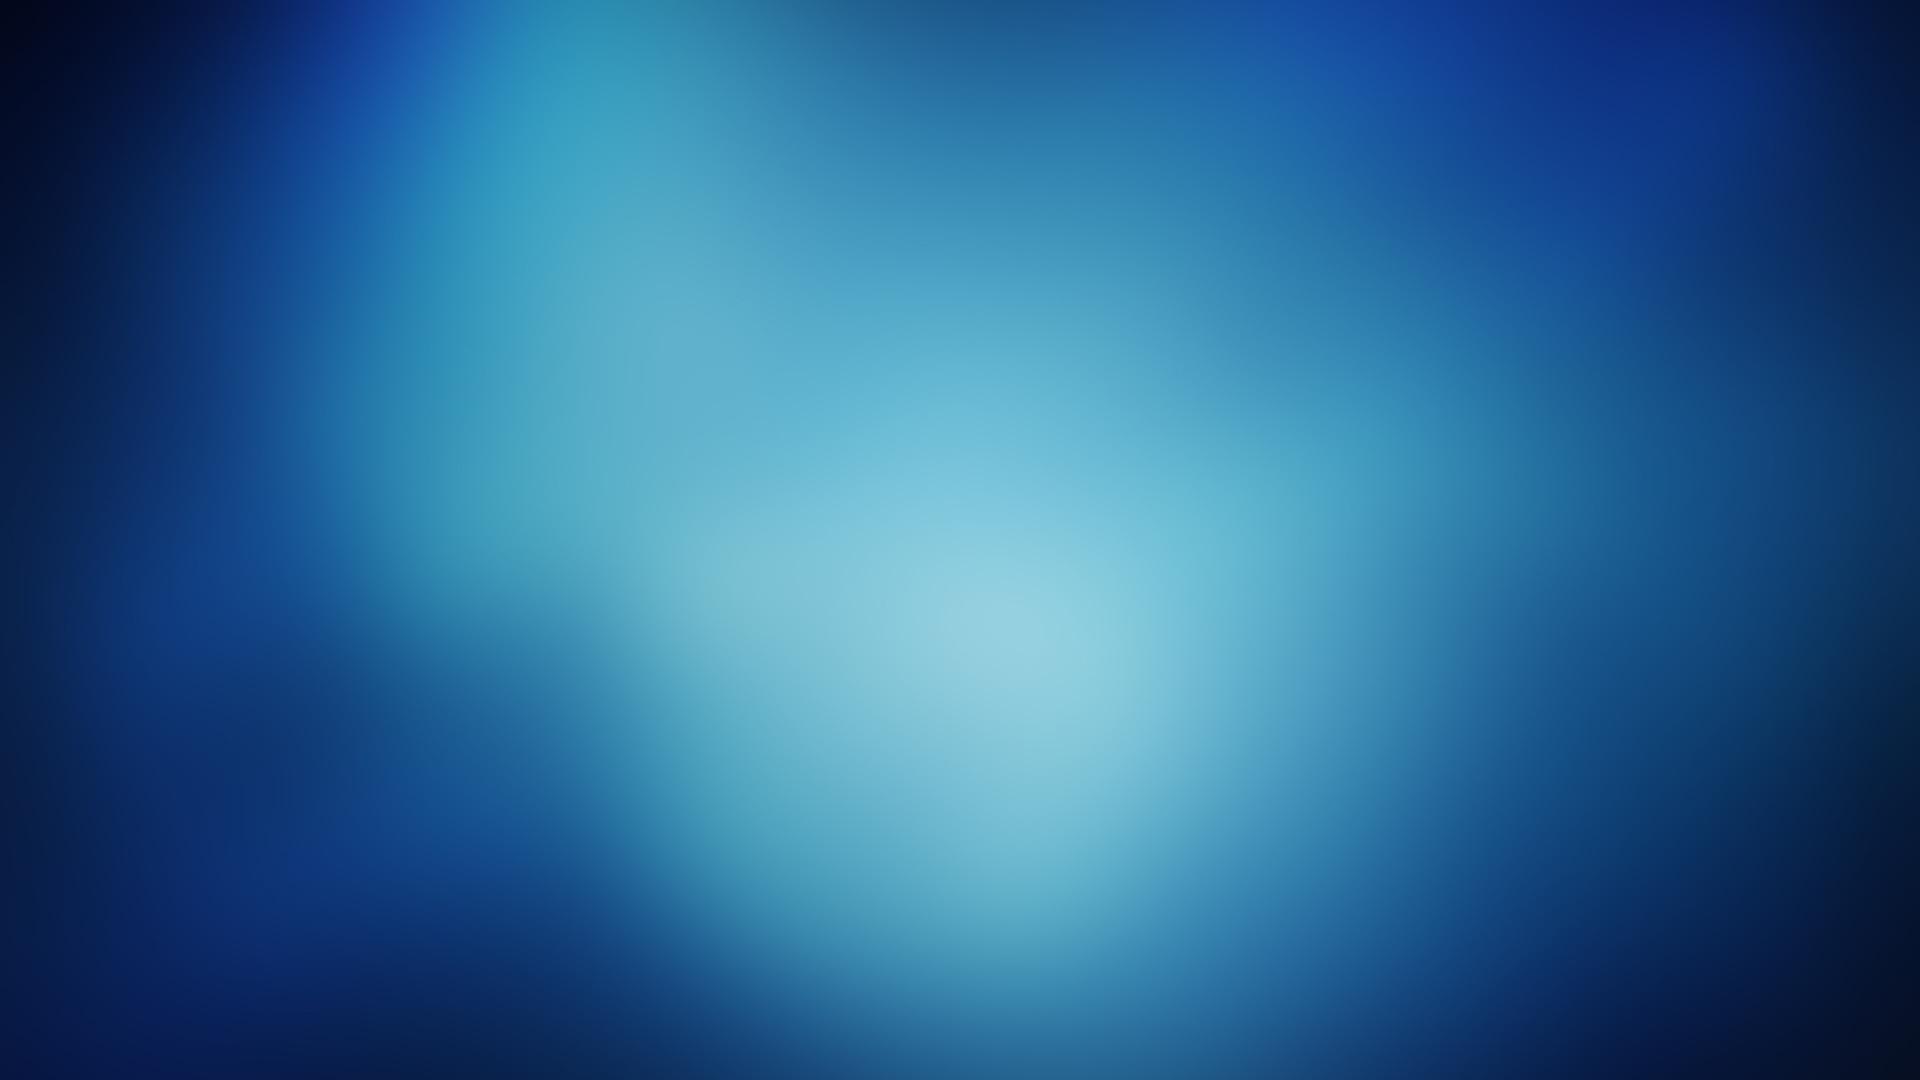 Blue Background wallpaper 1920x1080 6301 1920x1080